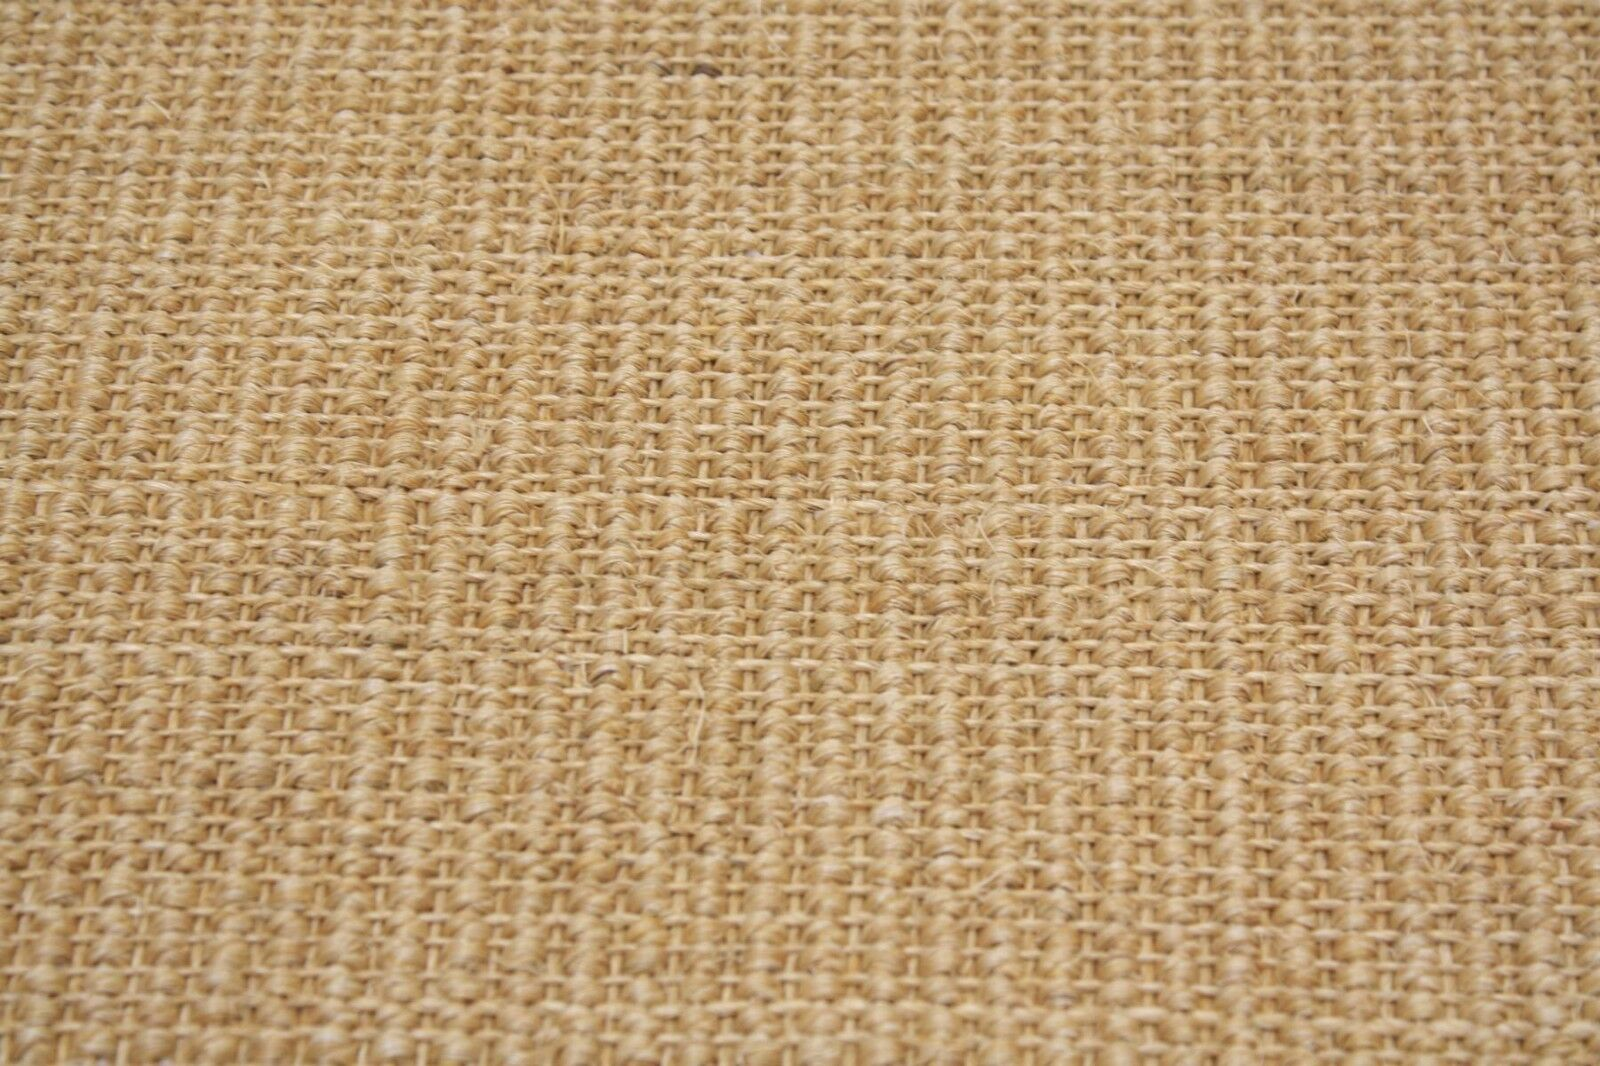 Sisal Teppich umkettelt umkettelt umkettelt natur 250x350cm 100% Sisal gekettelt fb24b9